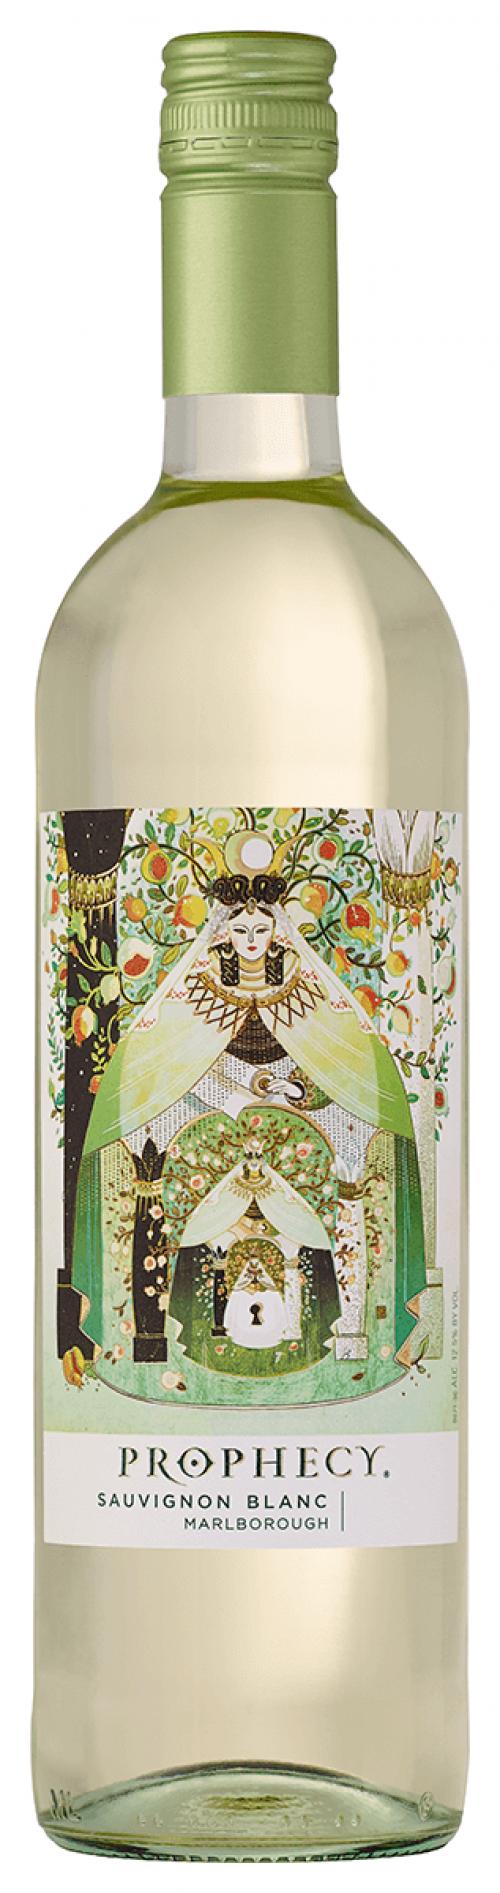 2019 Prophecy Sauvignon Blanc 750ml